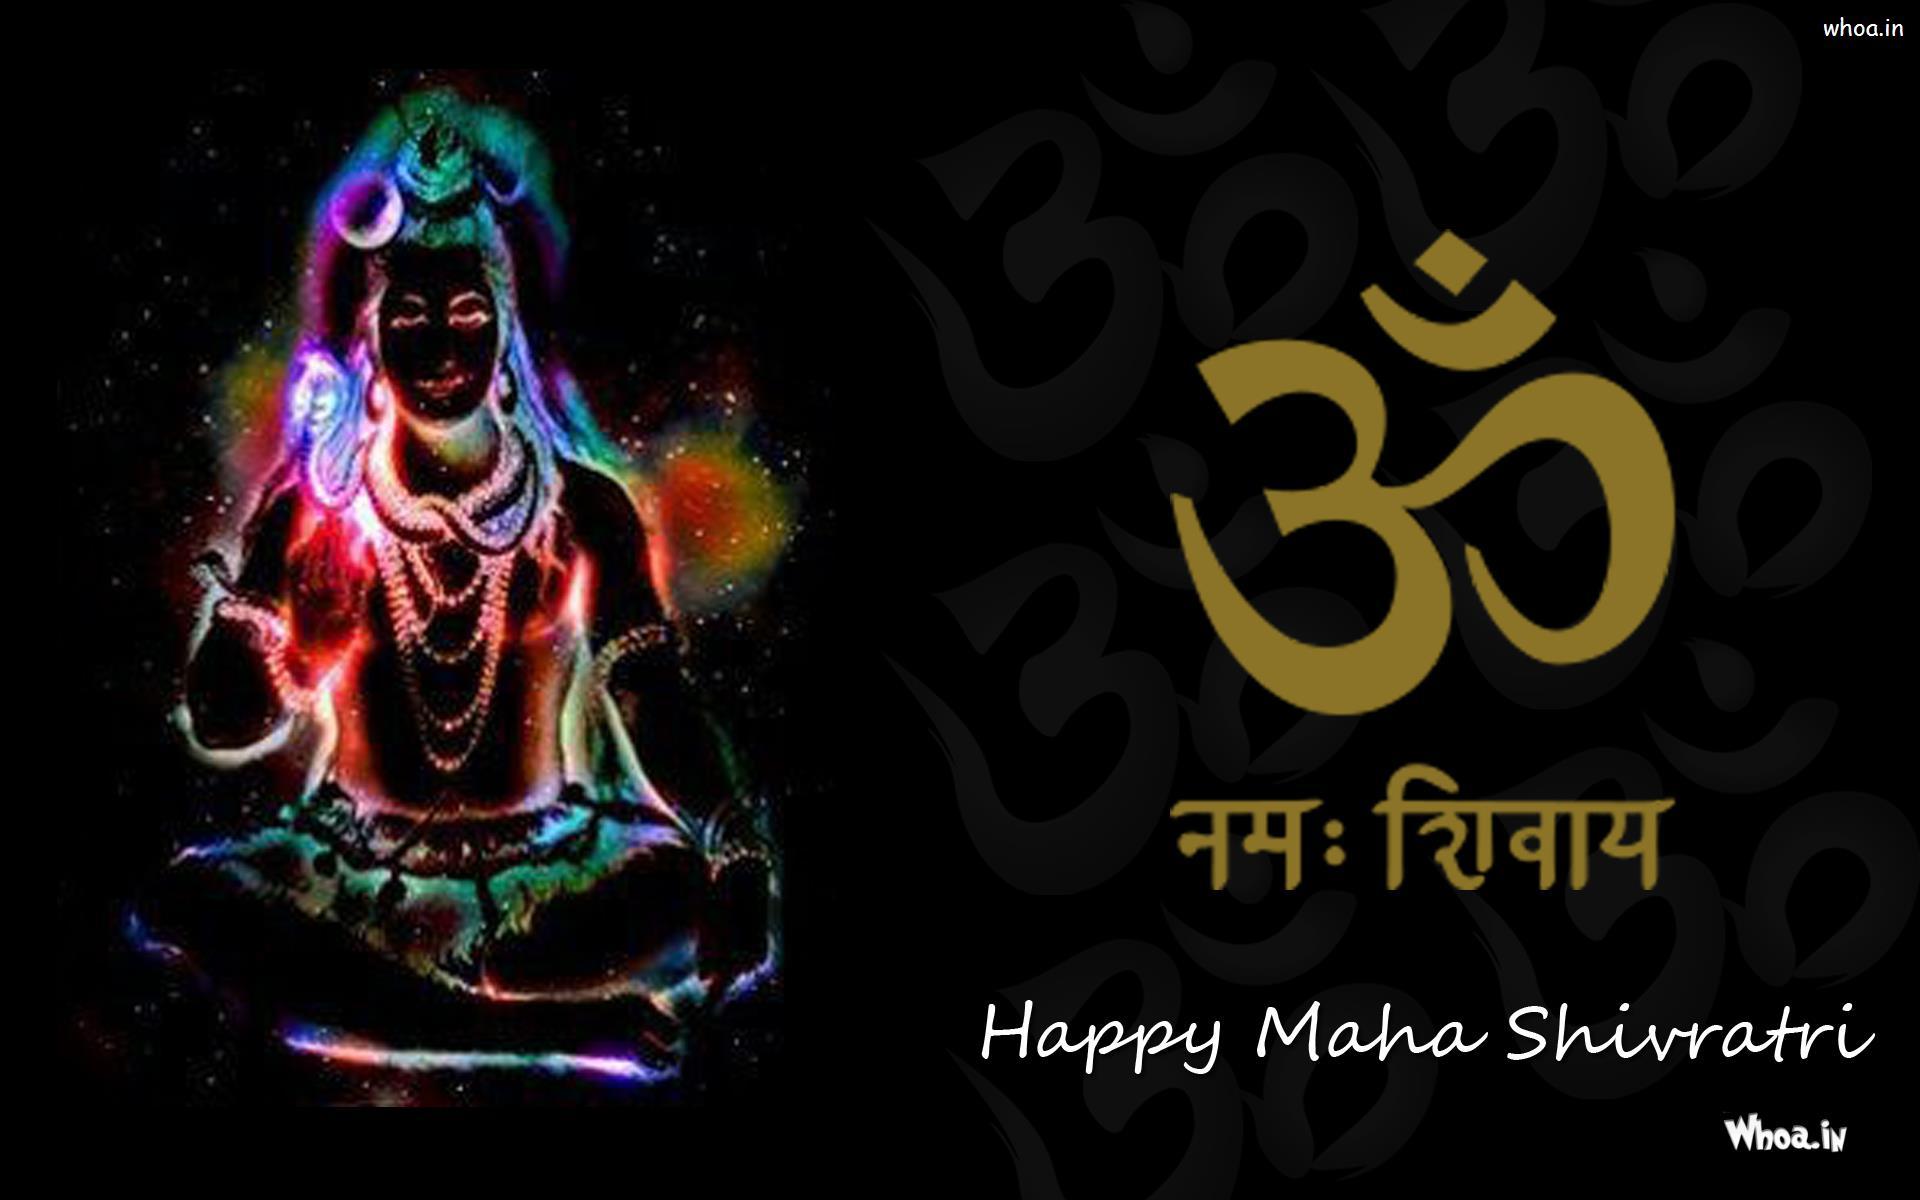 Om Namah Shivaya And Lord Shiva Wallpaper With Black Background